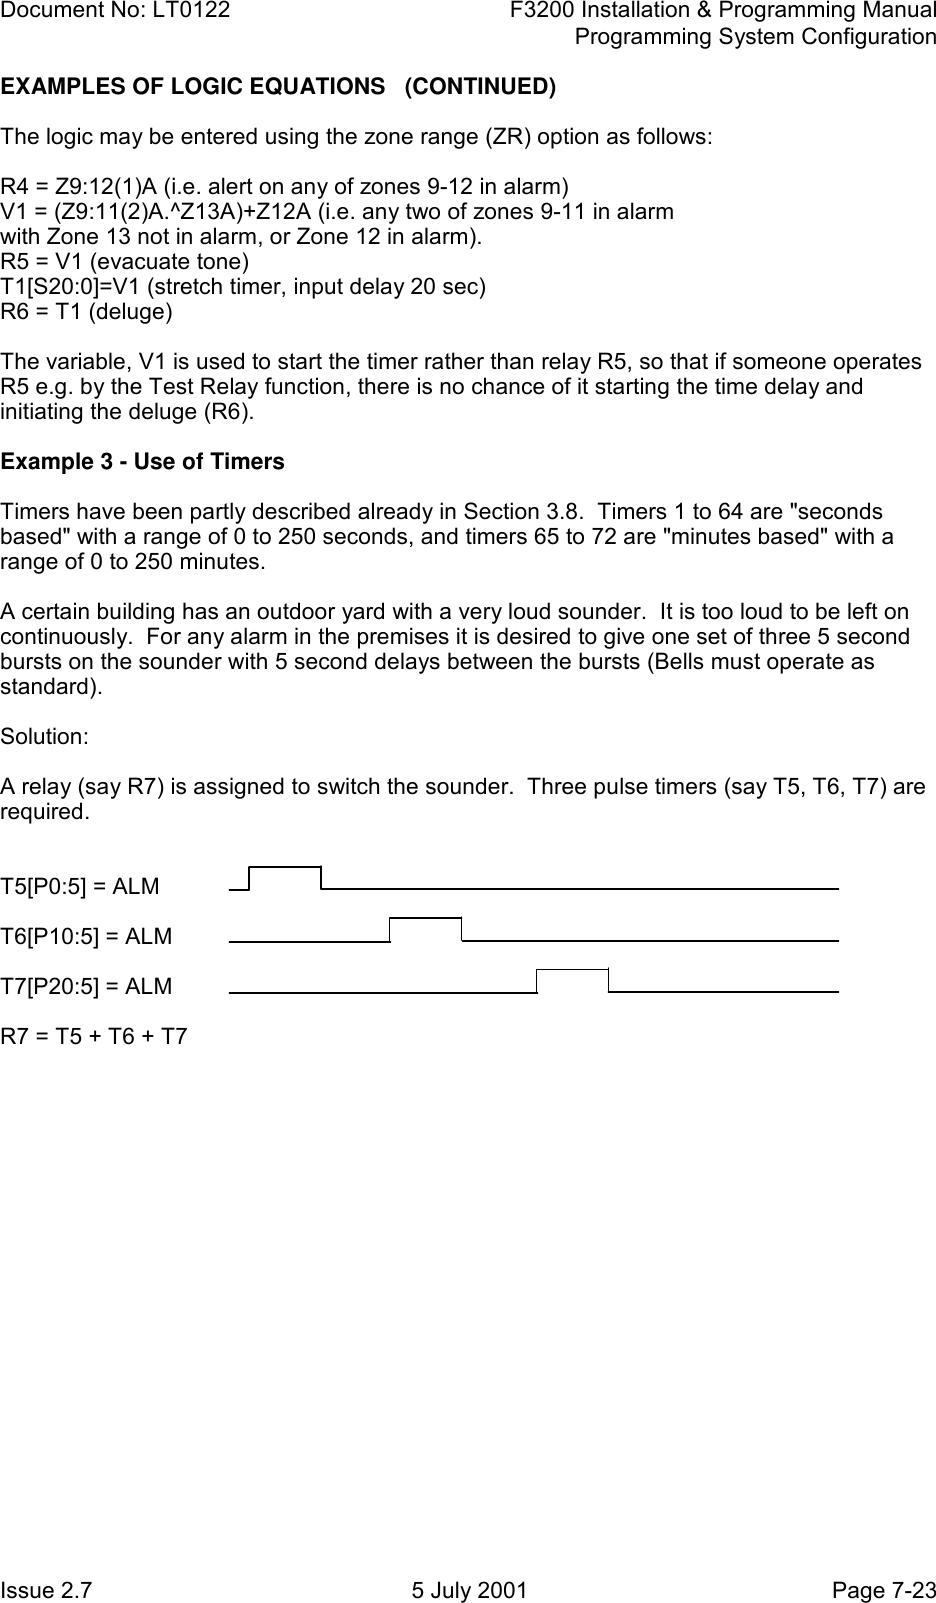 Tyco F3200 Users Manual LT0122 Fire Indicator Panel